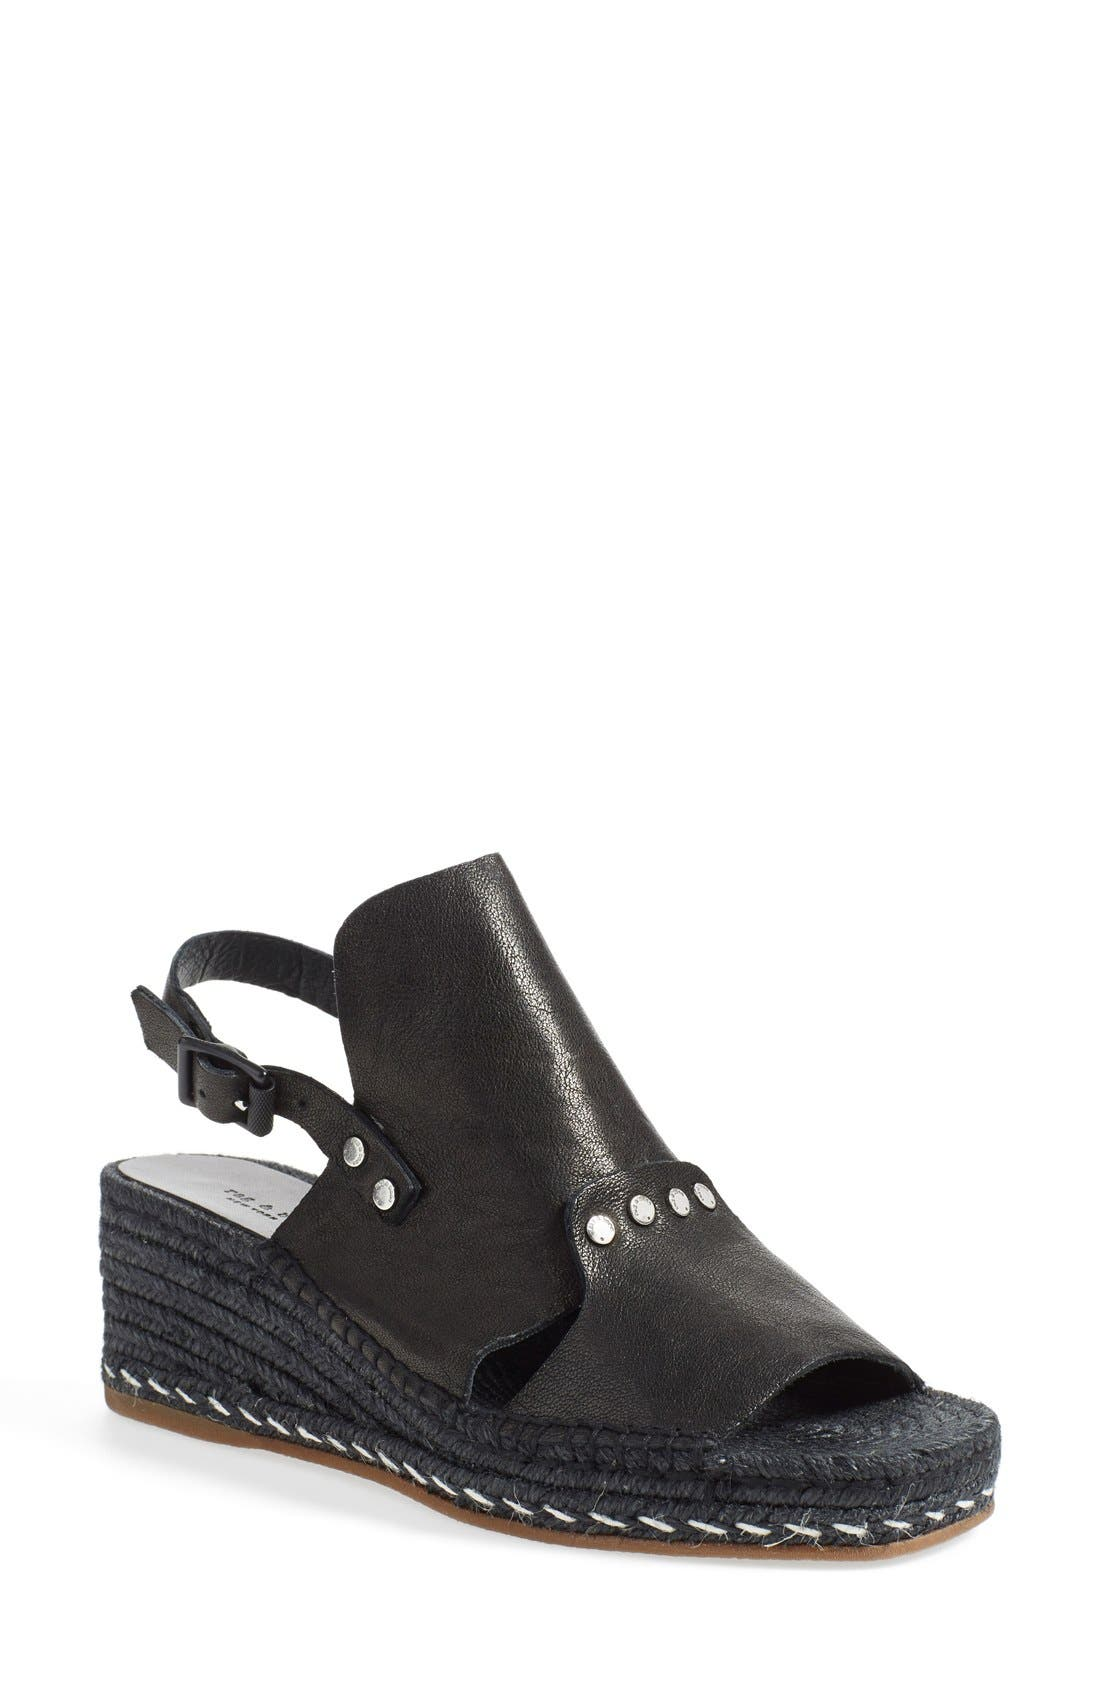 'Sayre II' Espadrille Wedge Sandal,                         Main,                         color, 001